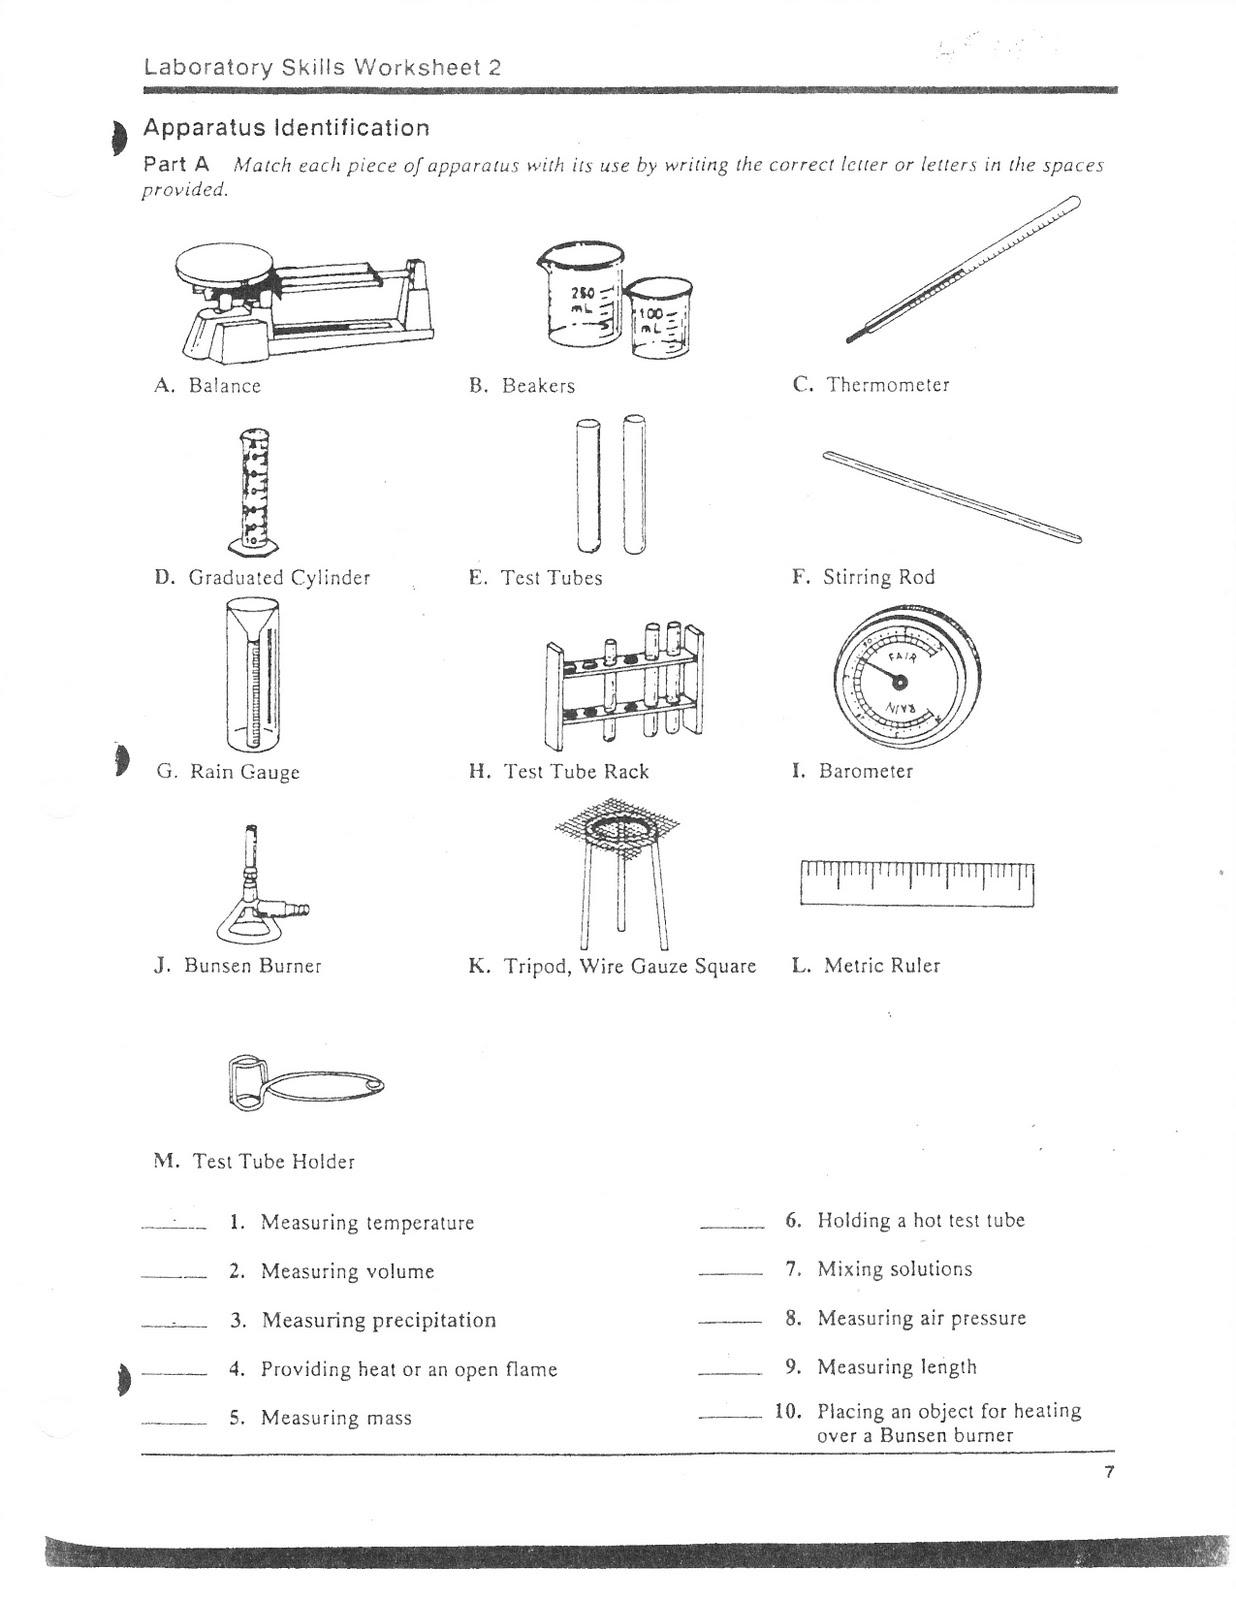 Science L B Equipment W Ksheet Free W Ksheets Libr Ry Downlo D